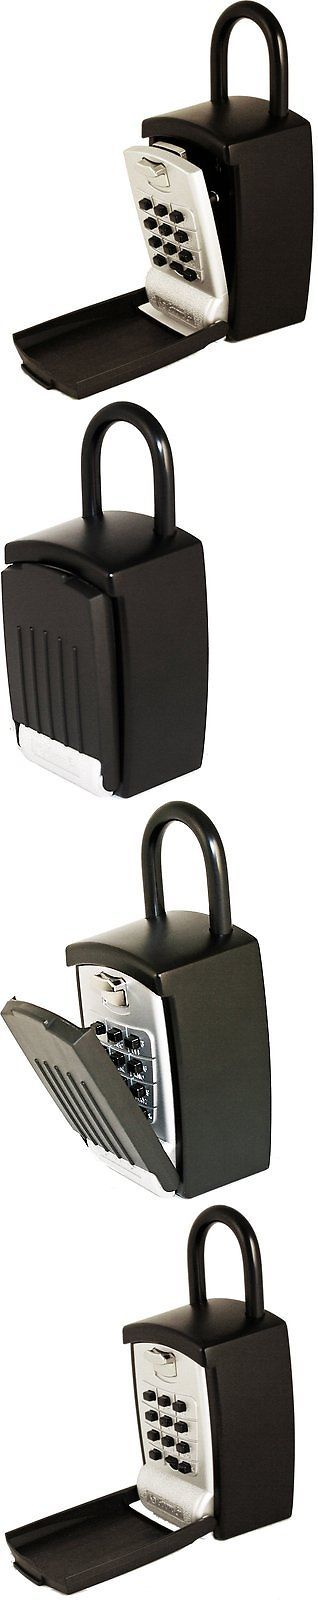 Hide-a-Keys 115945: Keyguard Sl-501 Punch Button Large Capacity Key Storage Shackle Lock Box -> BUY IT NOW ONLY: $43.75 on eBay!